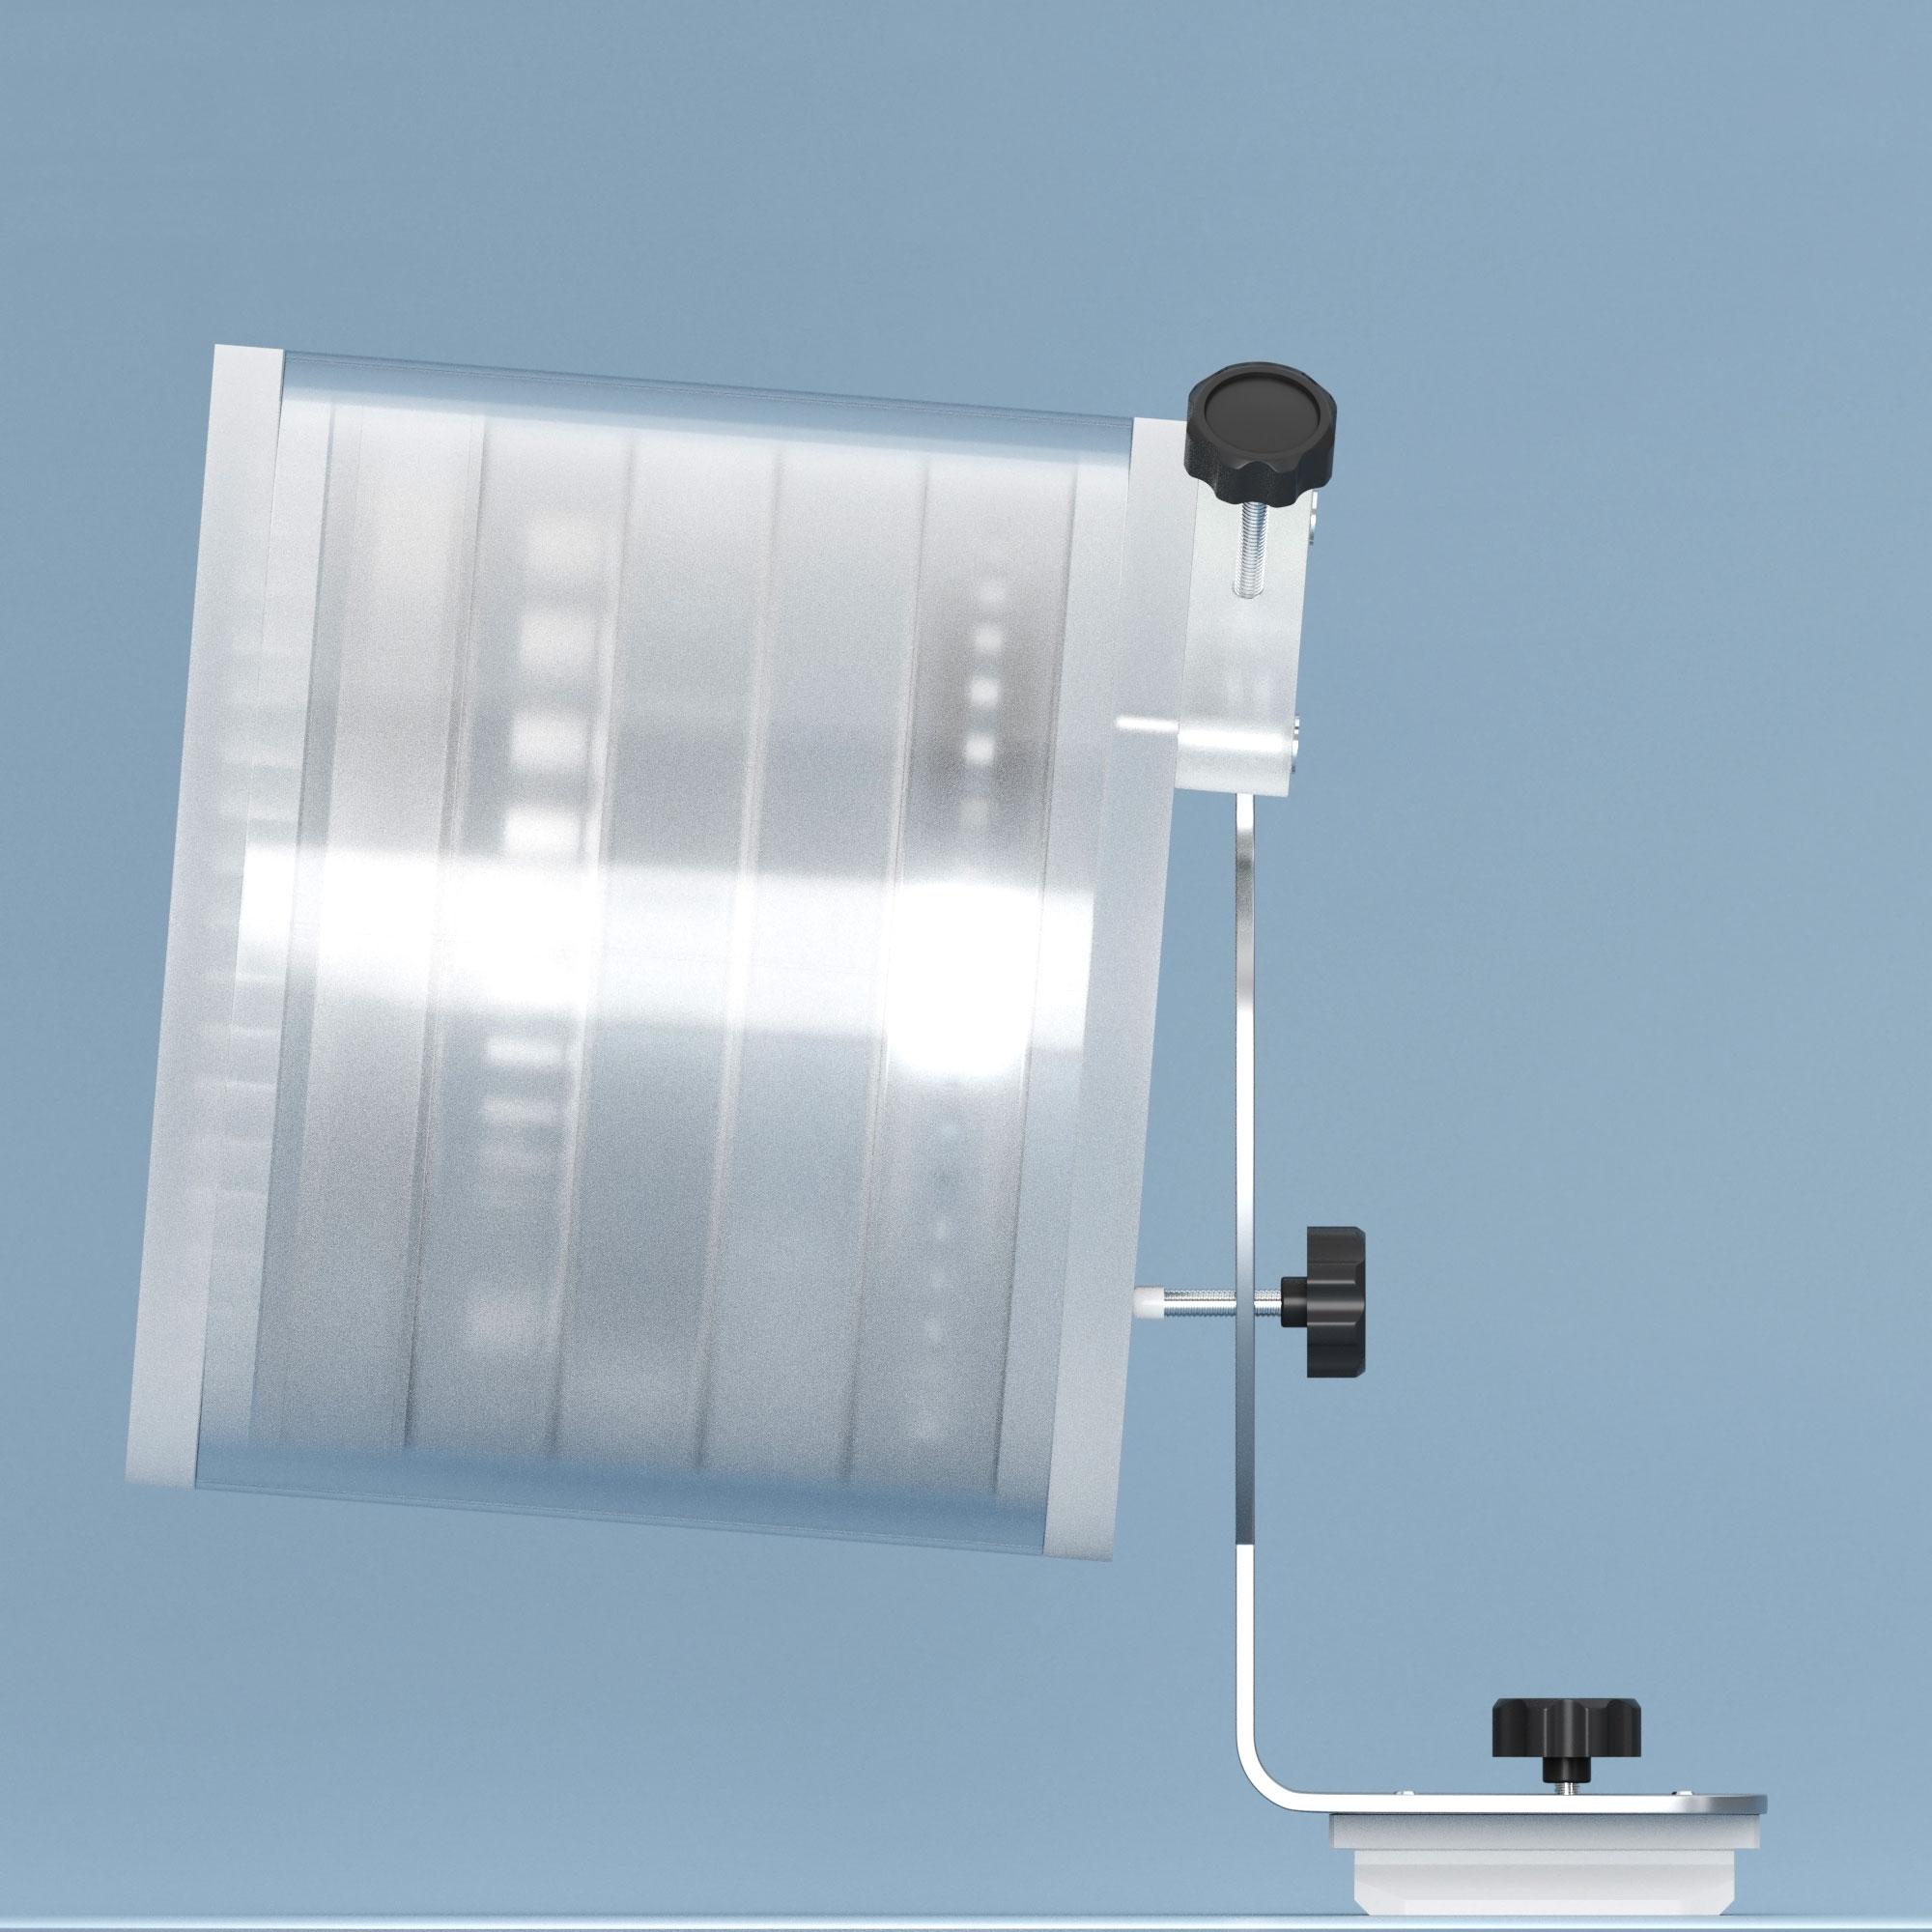 Pro-CT MK II toschiba mount